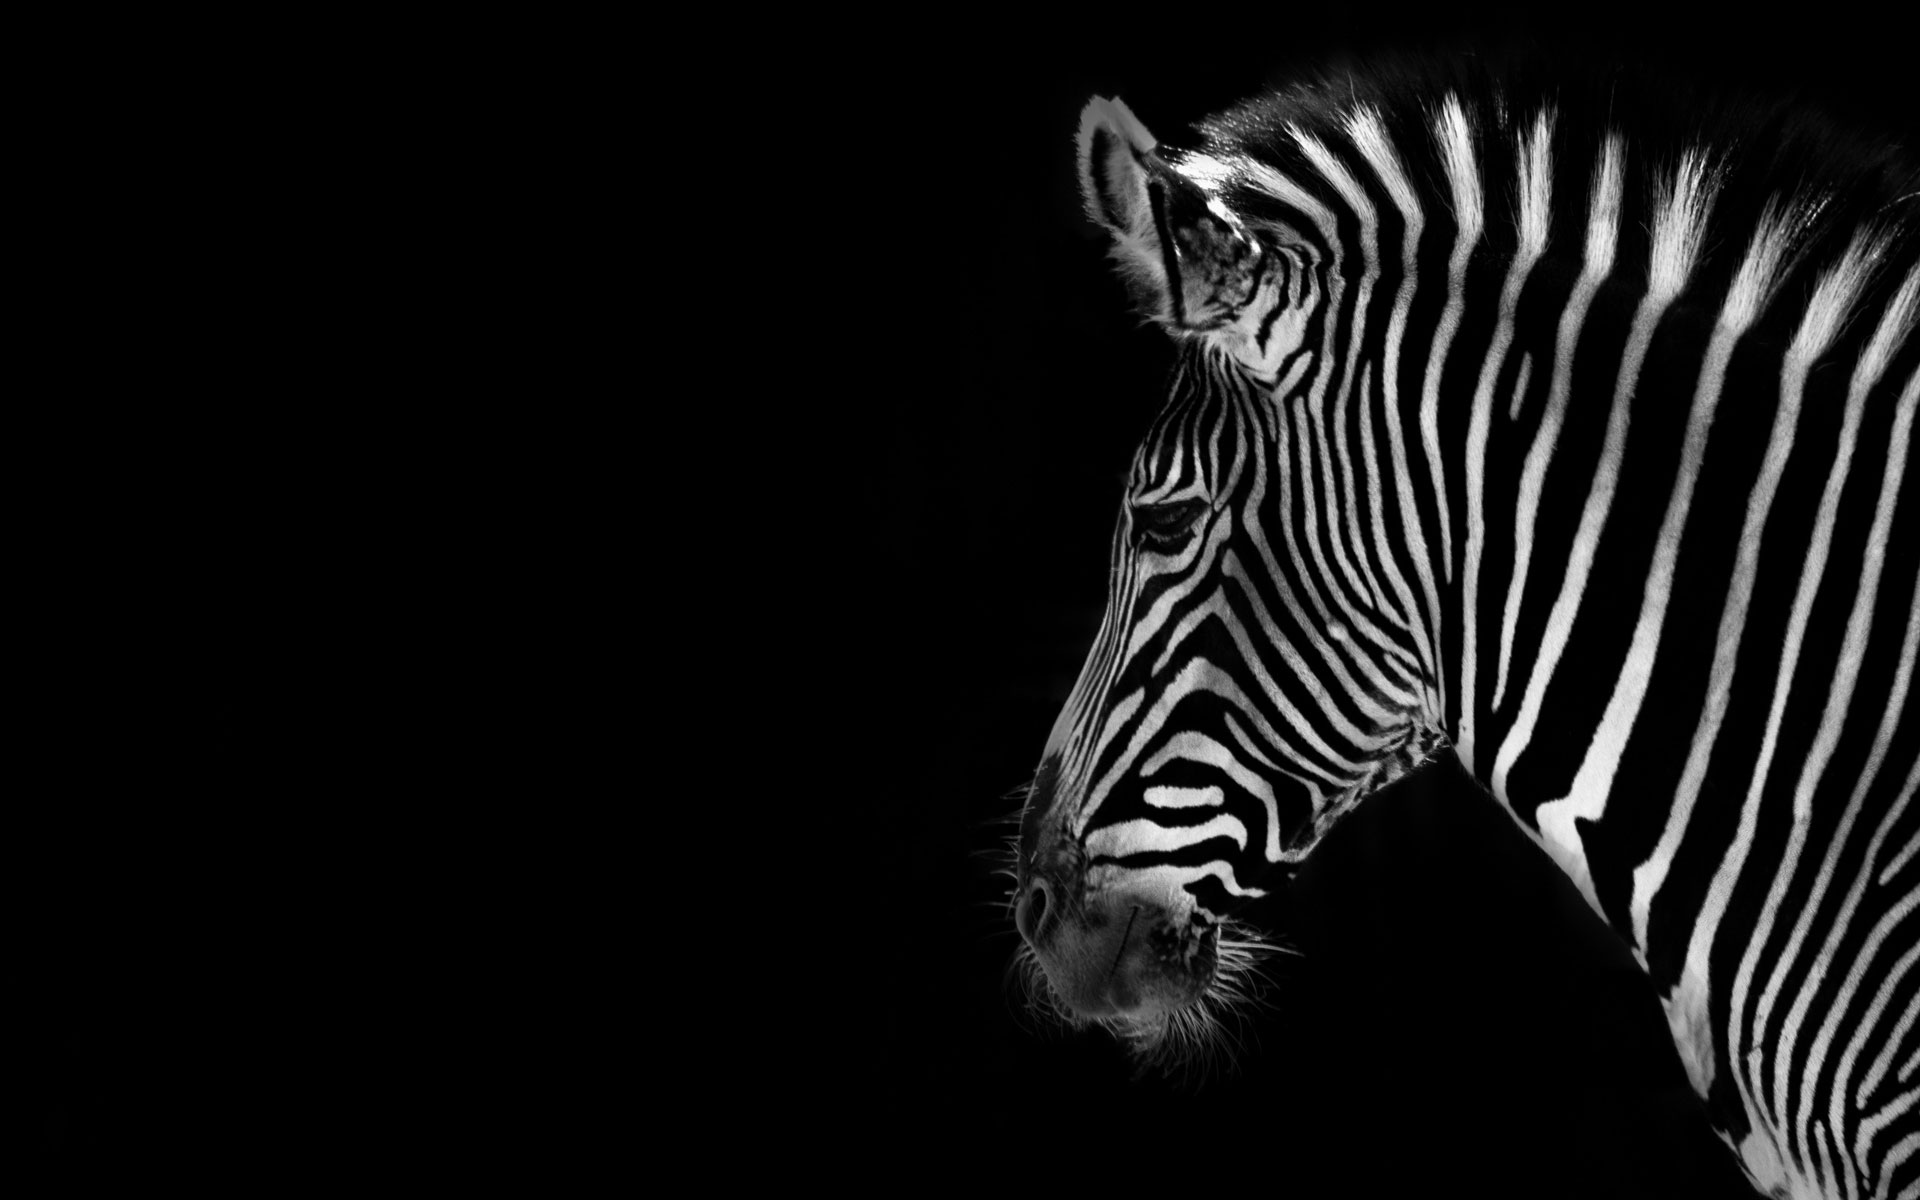 Black And White Animal Wallpaper Download Clip Art 1920x1200